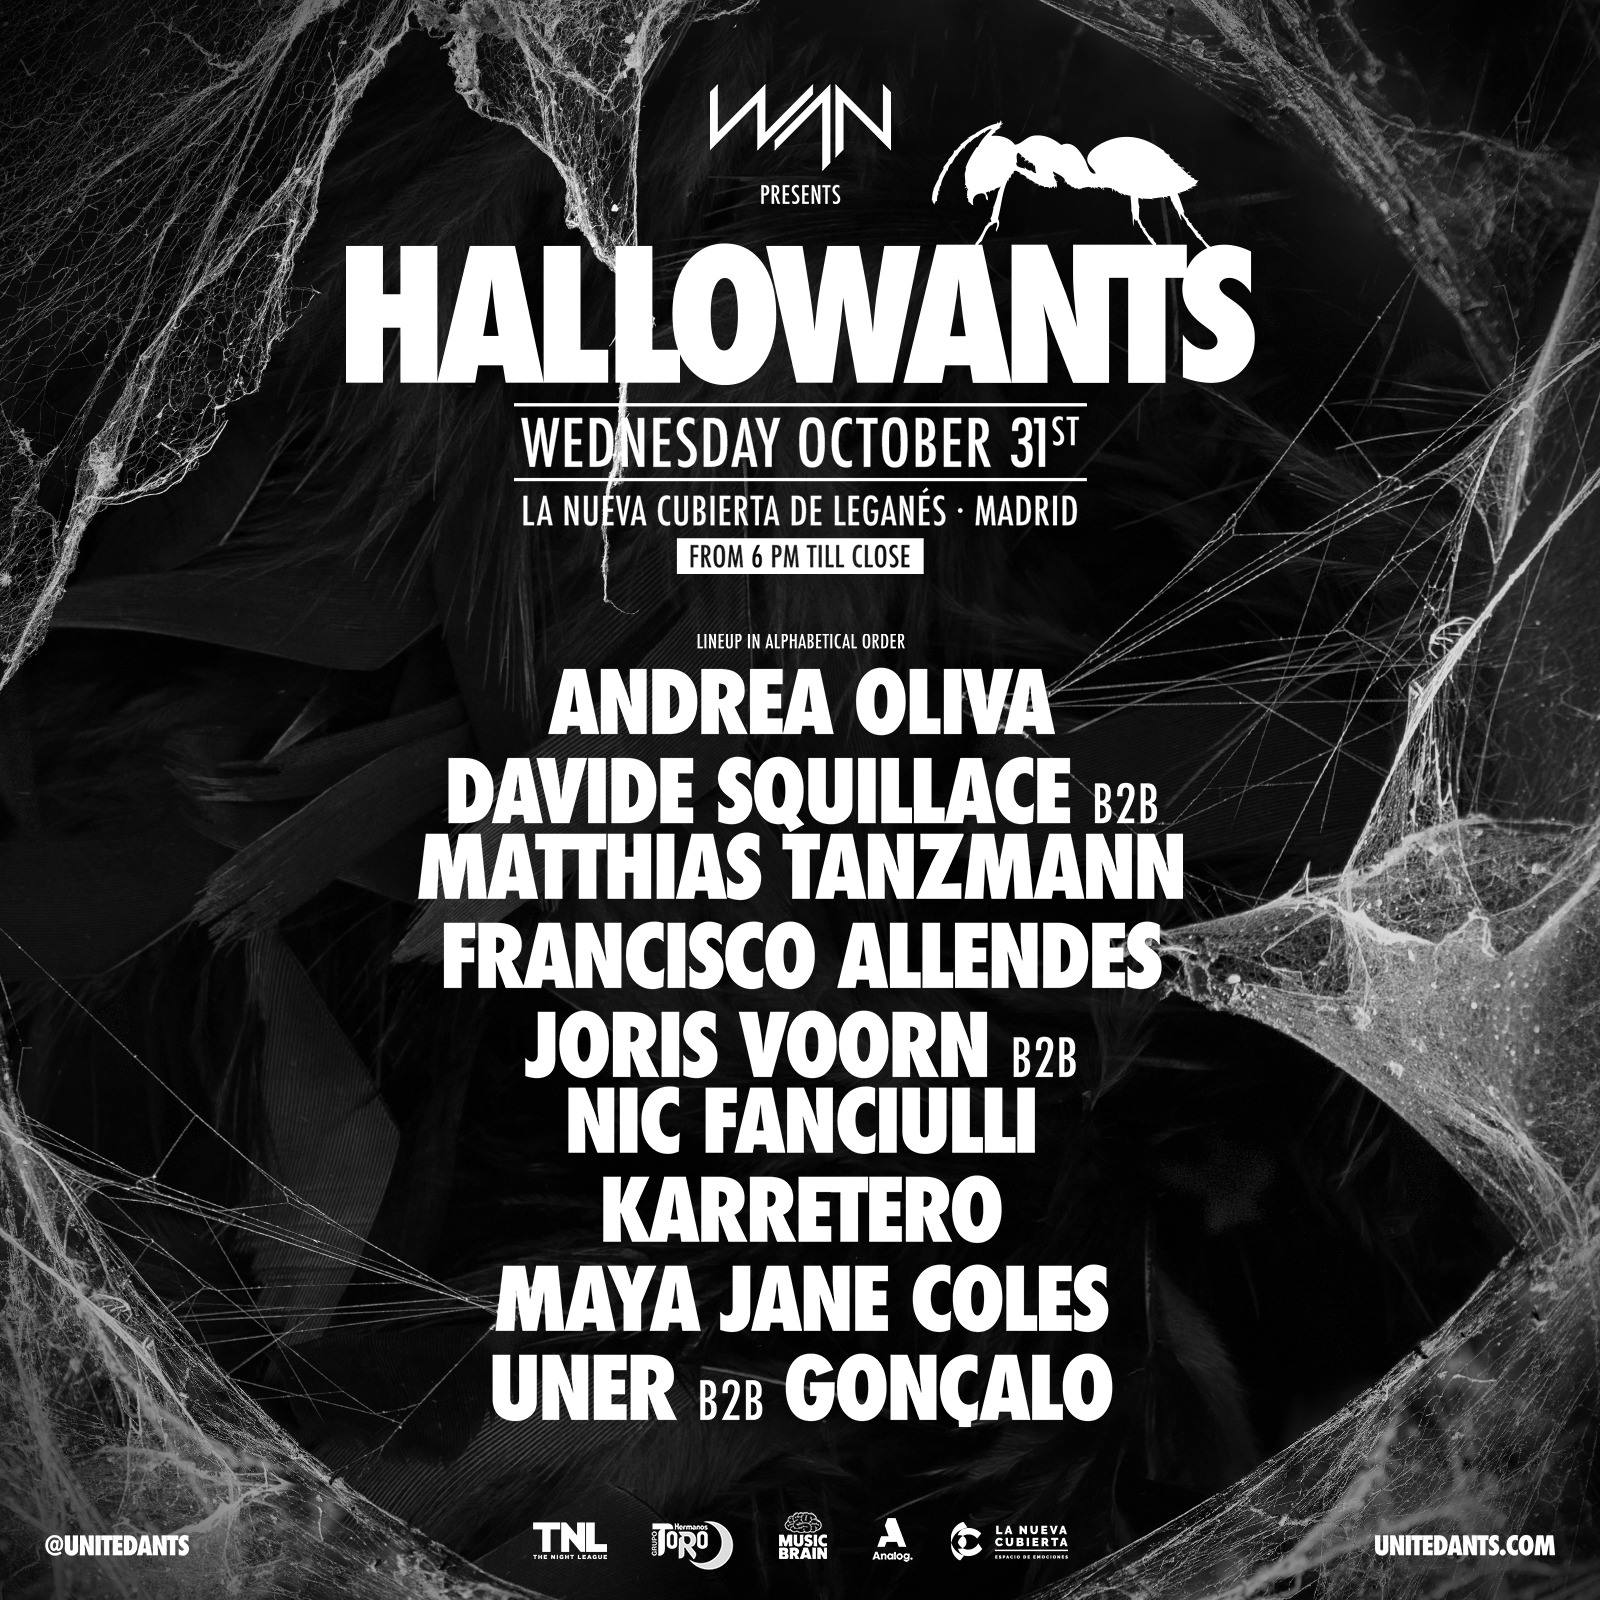 hallowants-5b9a8db896faa.jpeg